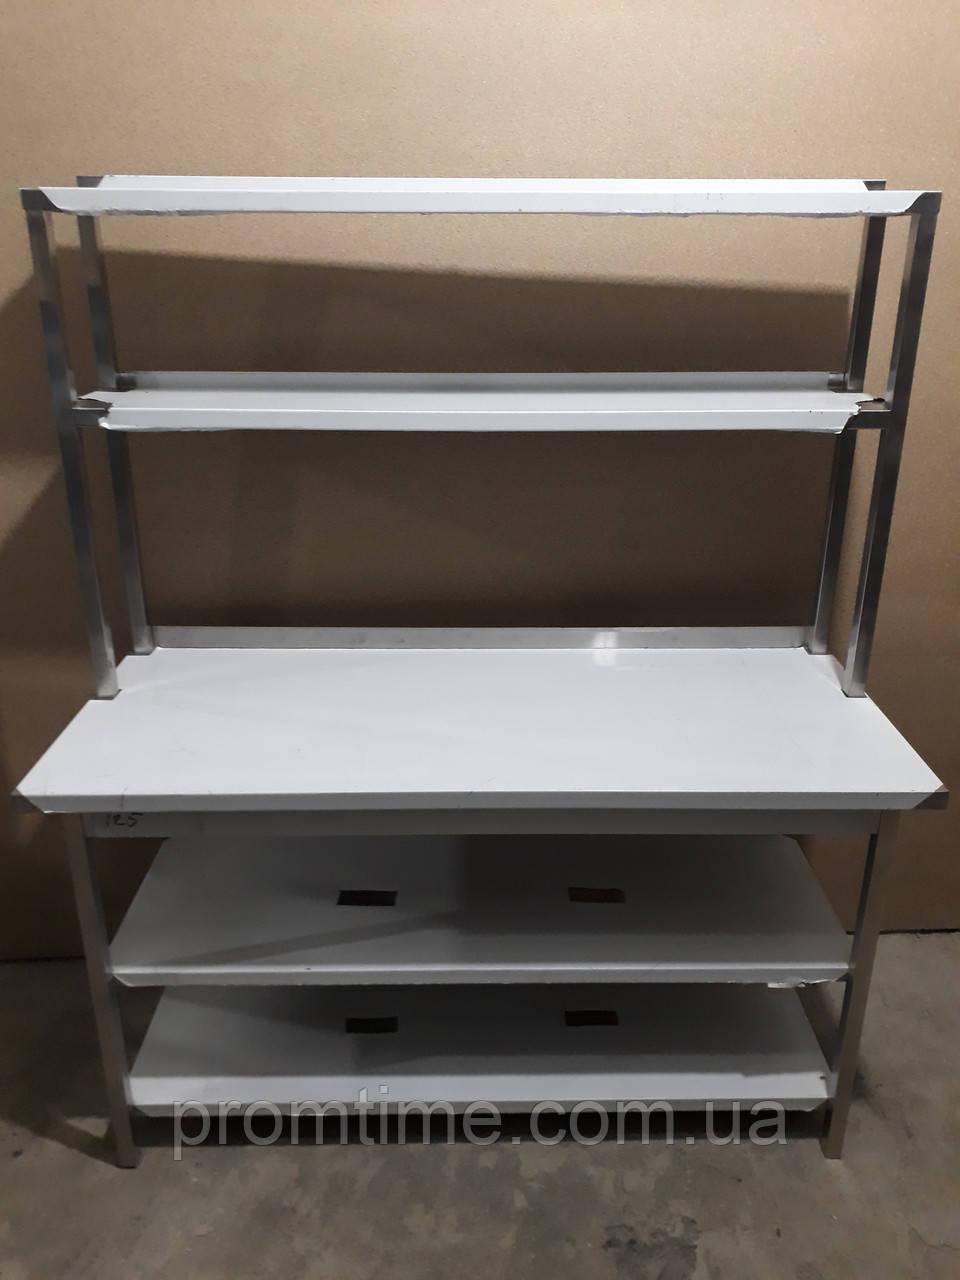 Стол производственный c полкой-надстройкой 1450х600х1700